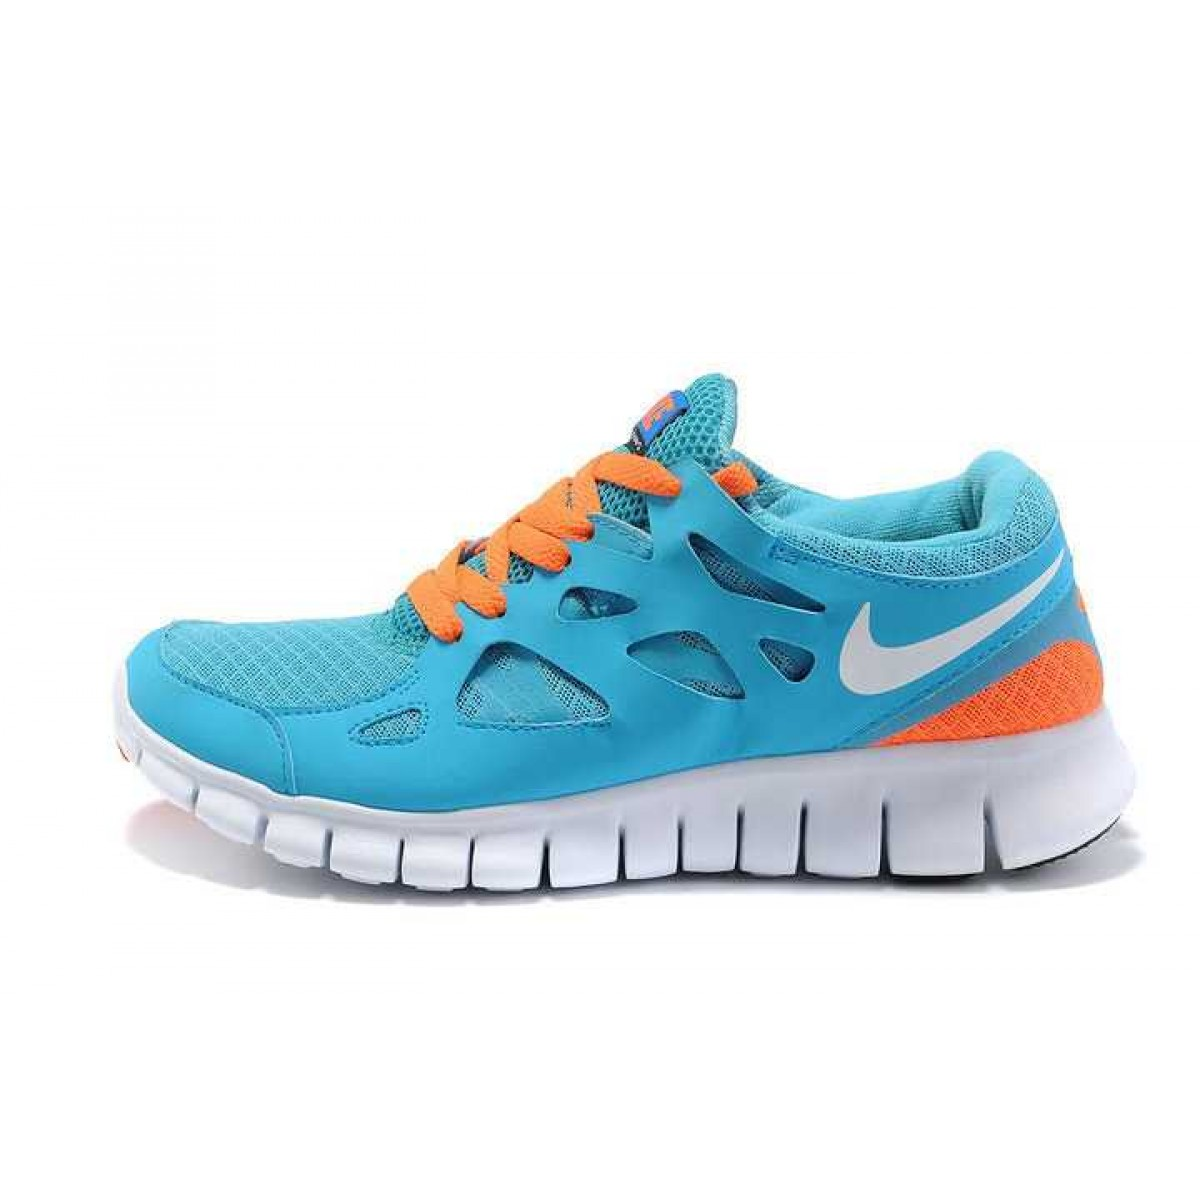 brand new a7108 2ca50 Nike Free Run 2 Homme Chaussures Blanc Bleu Orange,nike free nike,pas cher